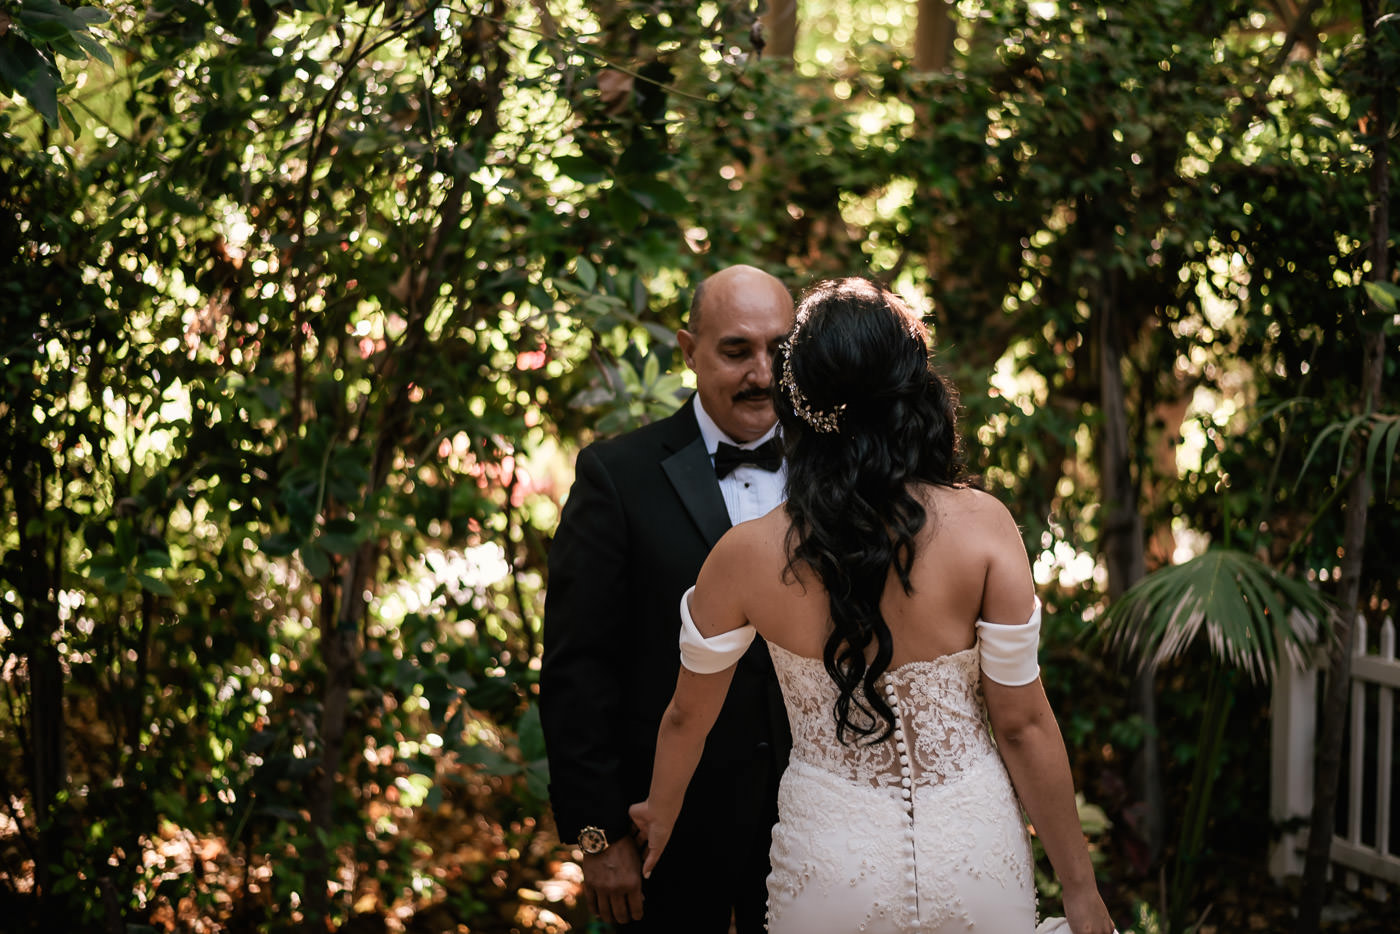 eden-gardens-wedding-photographer-romantic-10.jpg